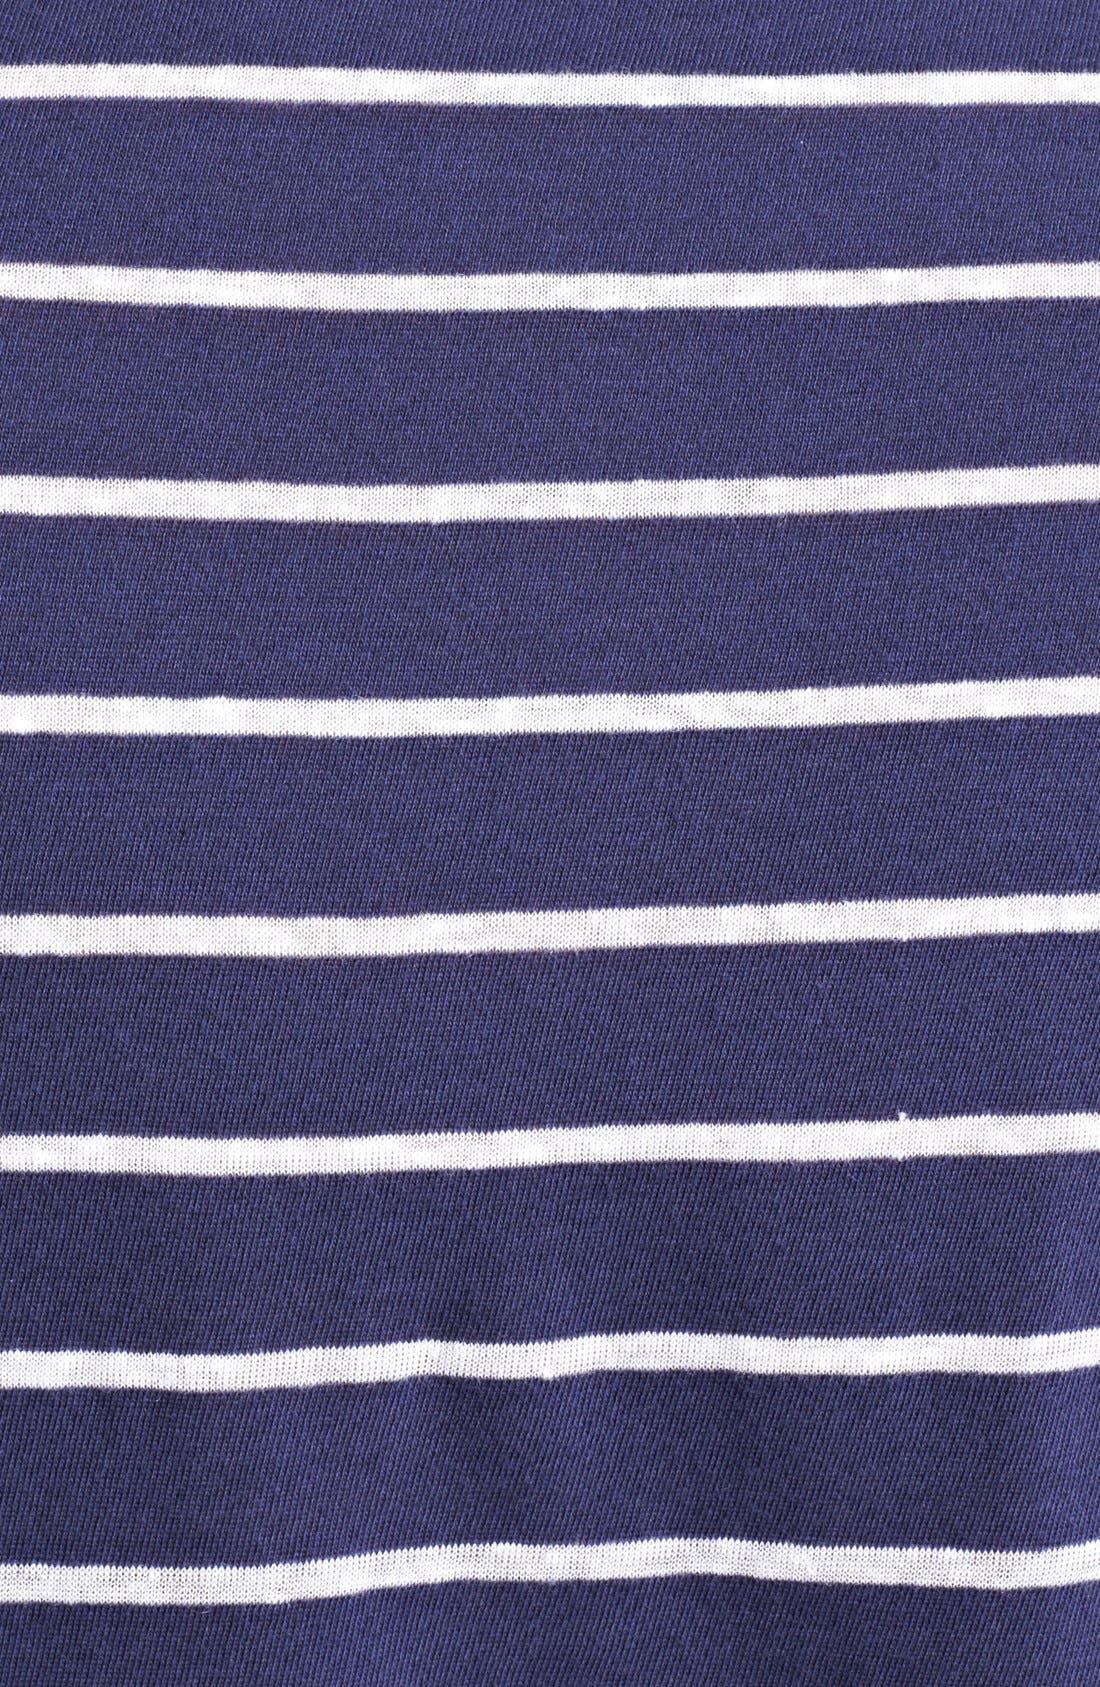 Alternate Image 3  - Michael Bastian Stripe Jersey Polo